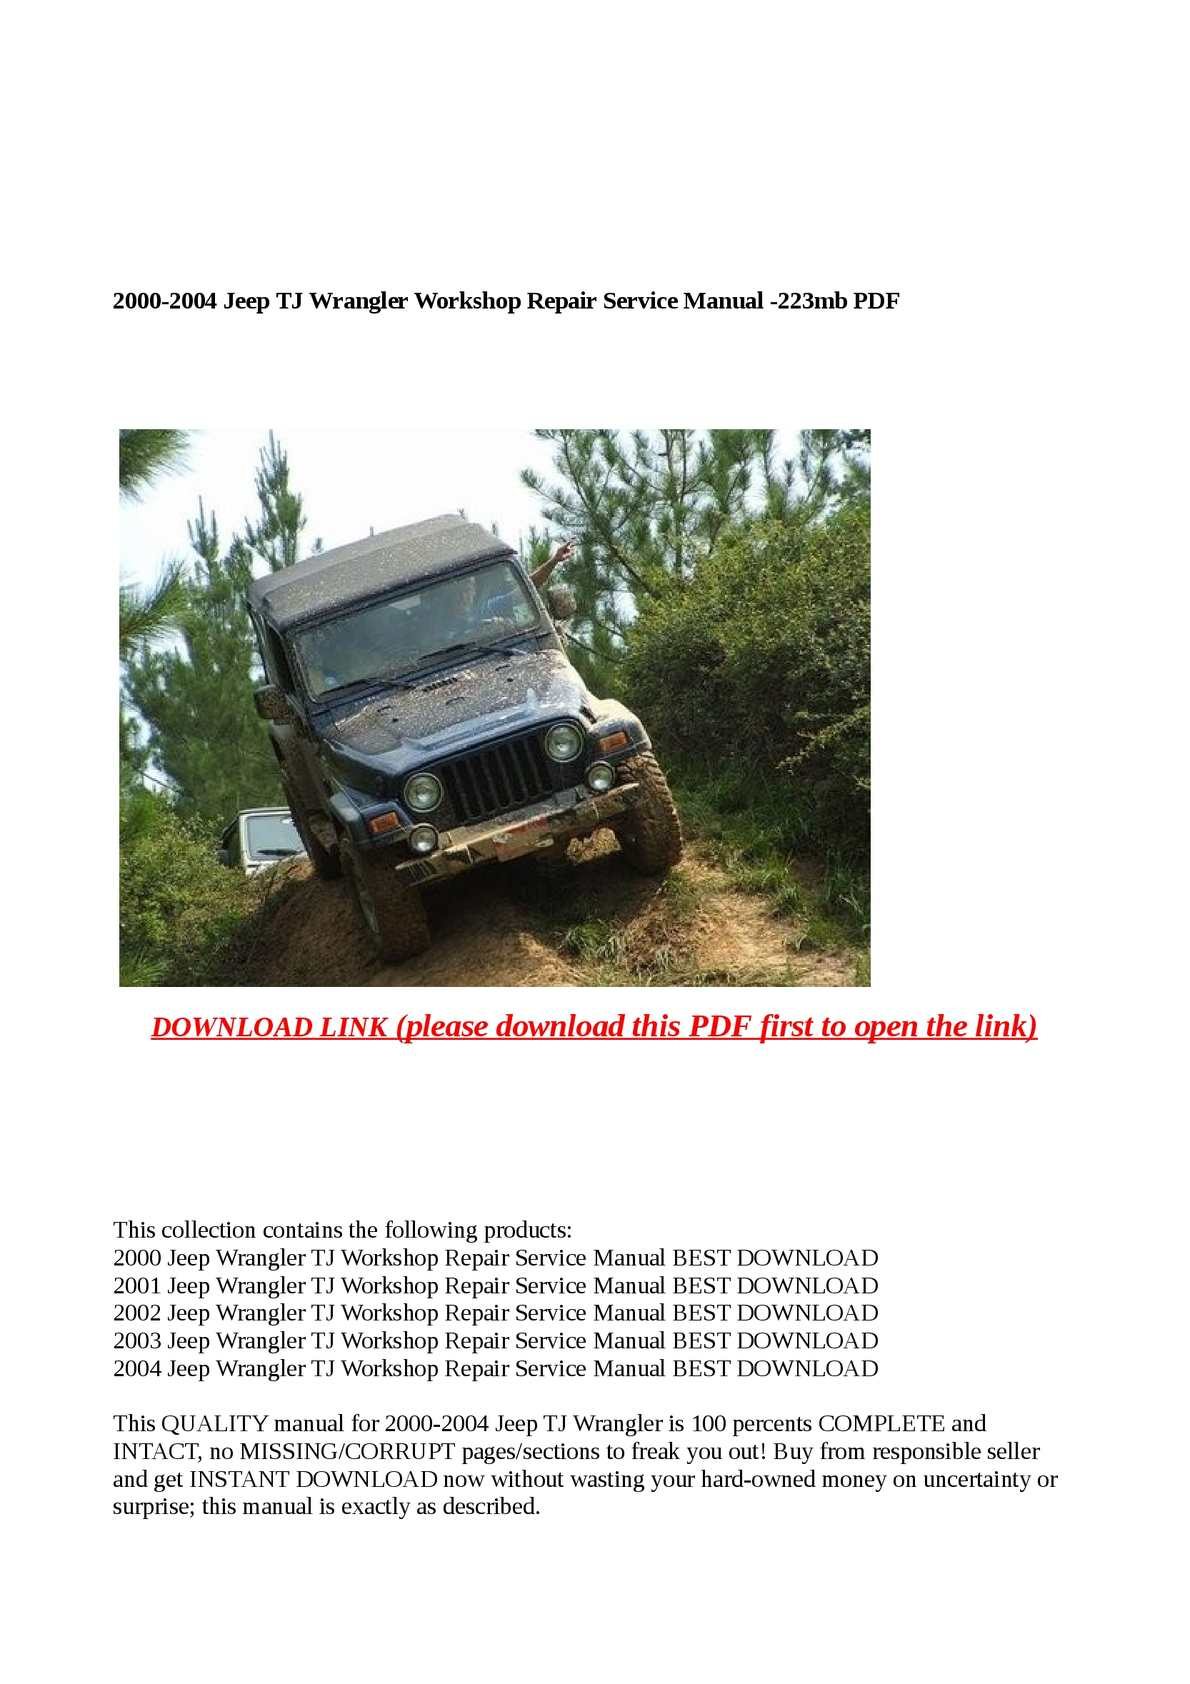 Calaméo - 2000-2004 Jeep TJ Wrangler Workshop Repair Service Manual -223m